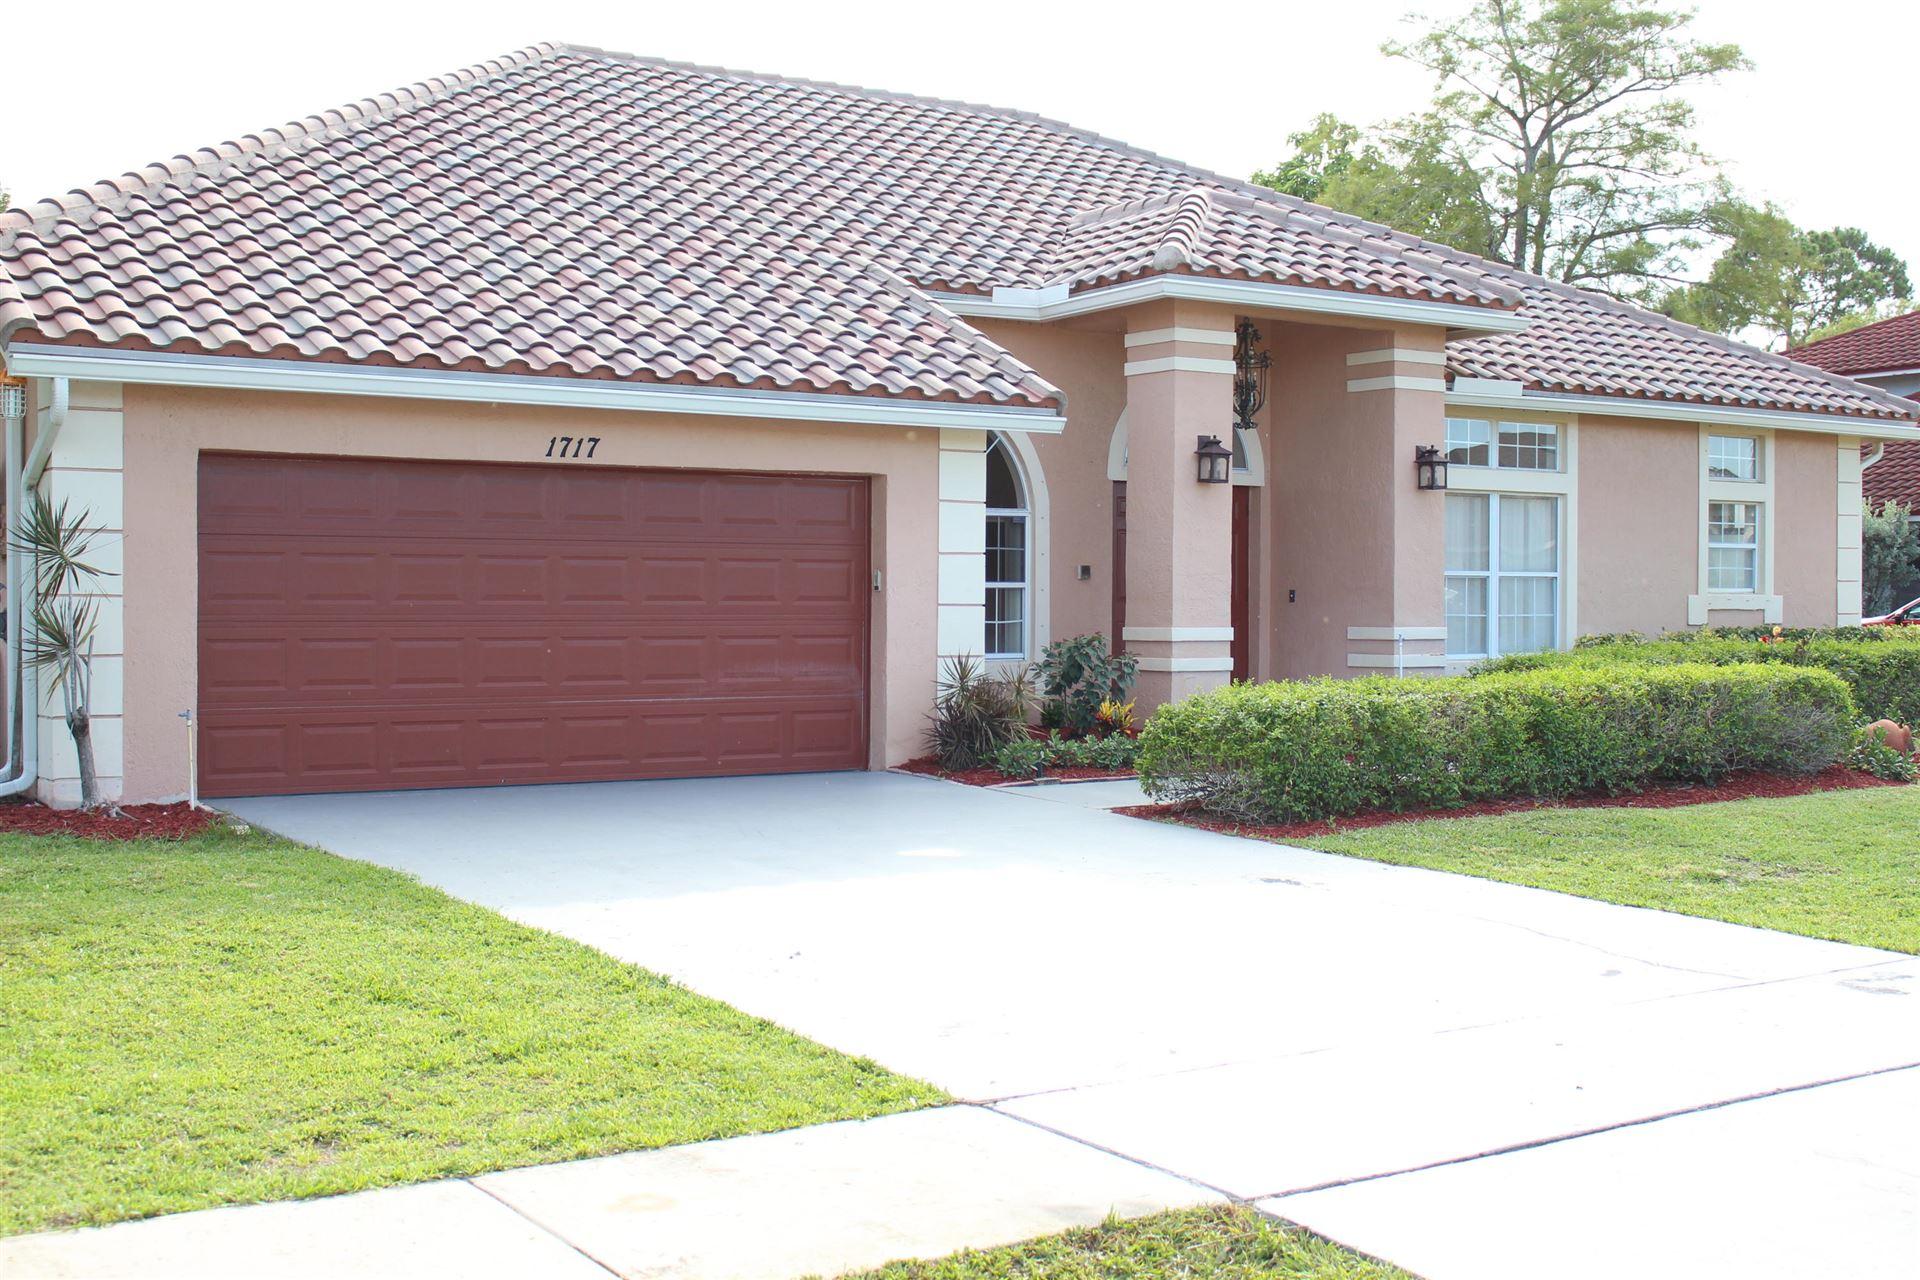 1717 Wiltshire Village Drive, Wellington, FL 33414 - MLS#: RX-10721349